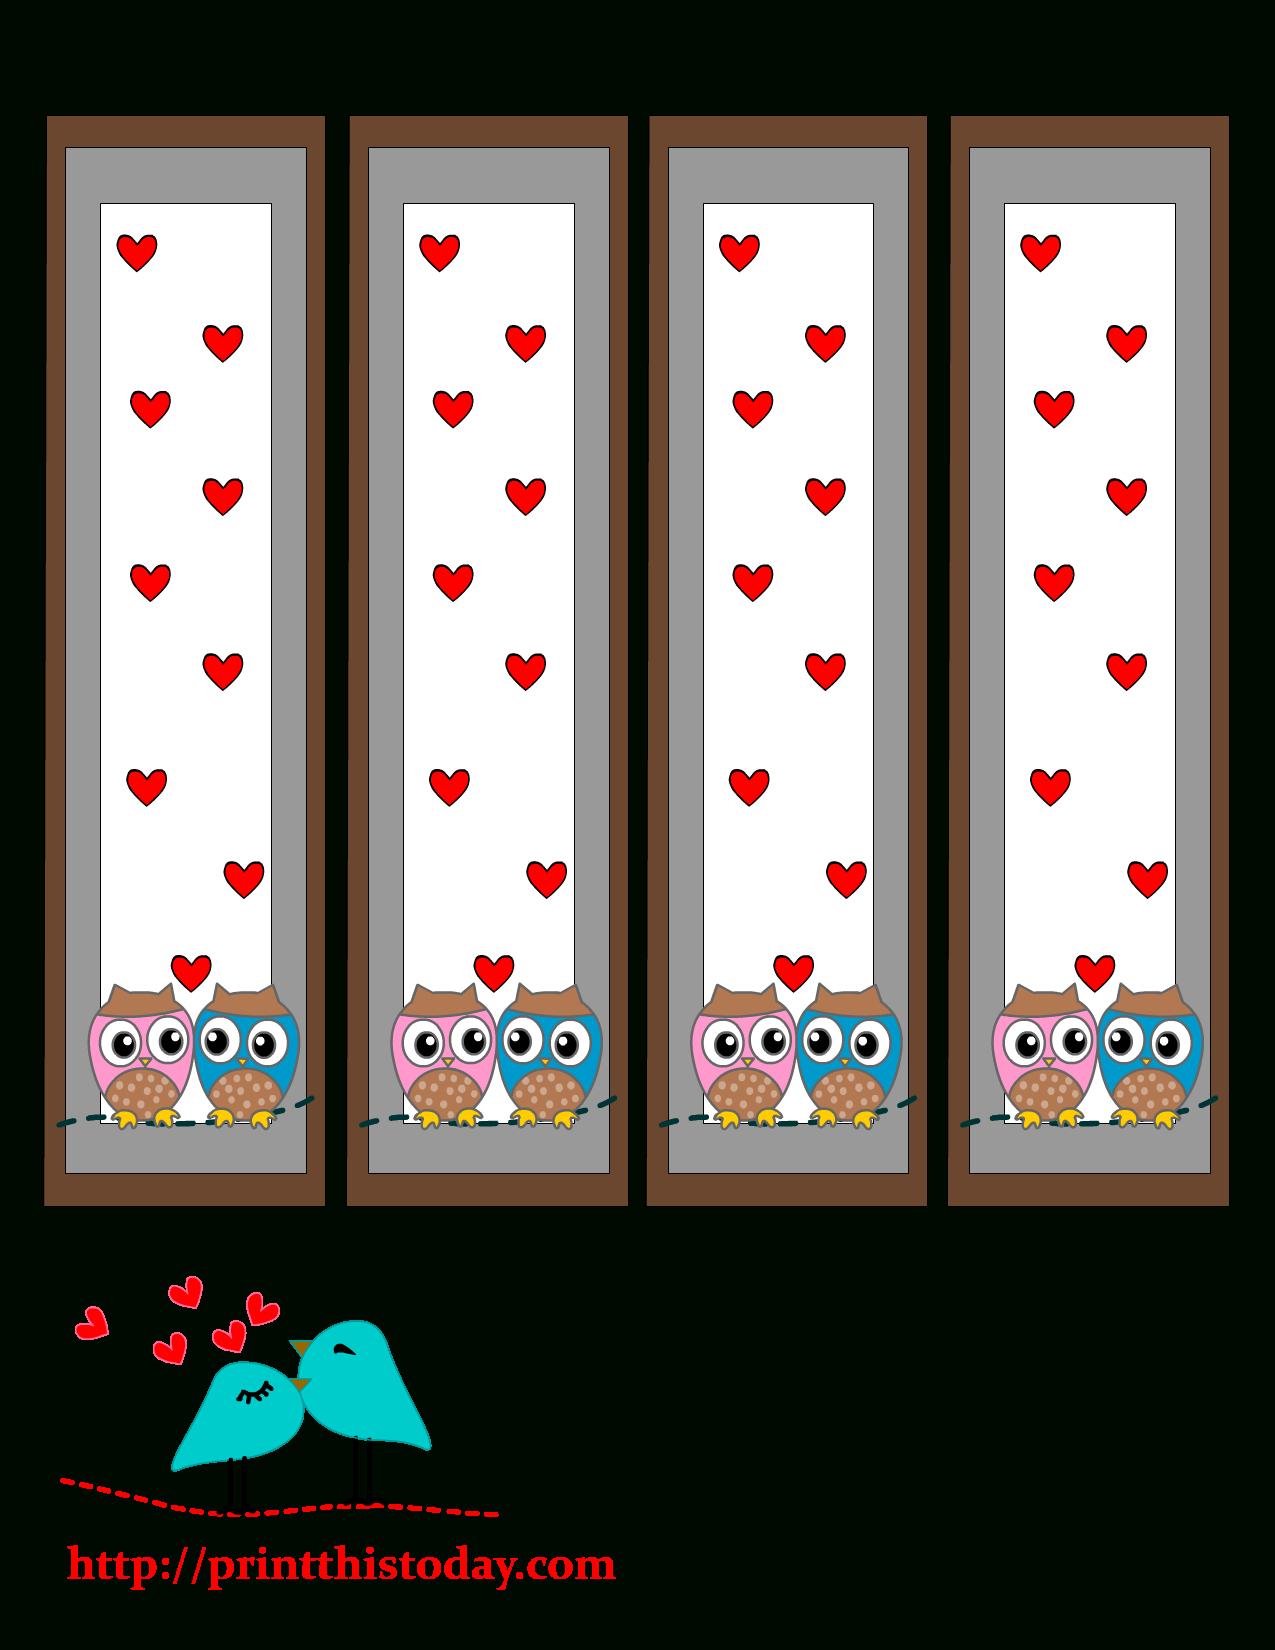 Free Valentines Printables Owl Bookmark - 1.17.kaartenstemp.nl • - Free Printable Owl Bookmarks